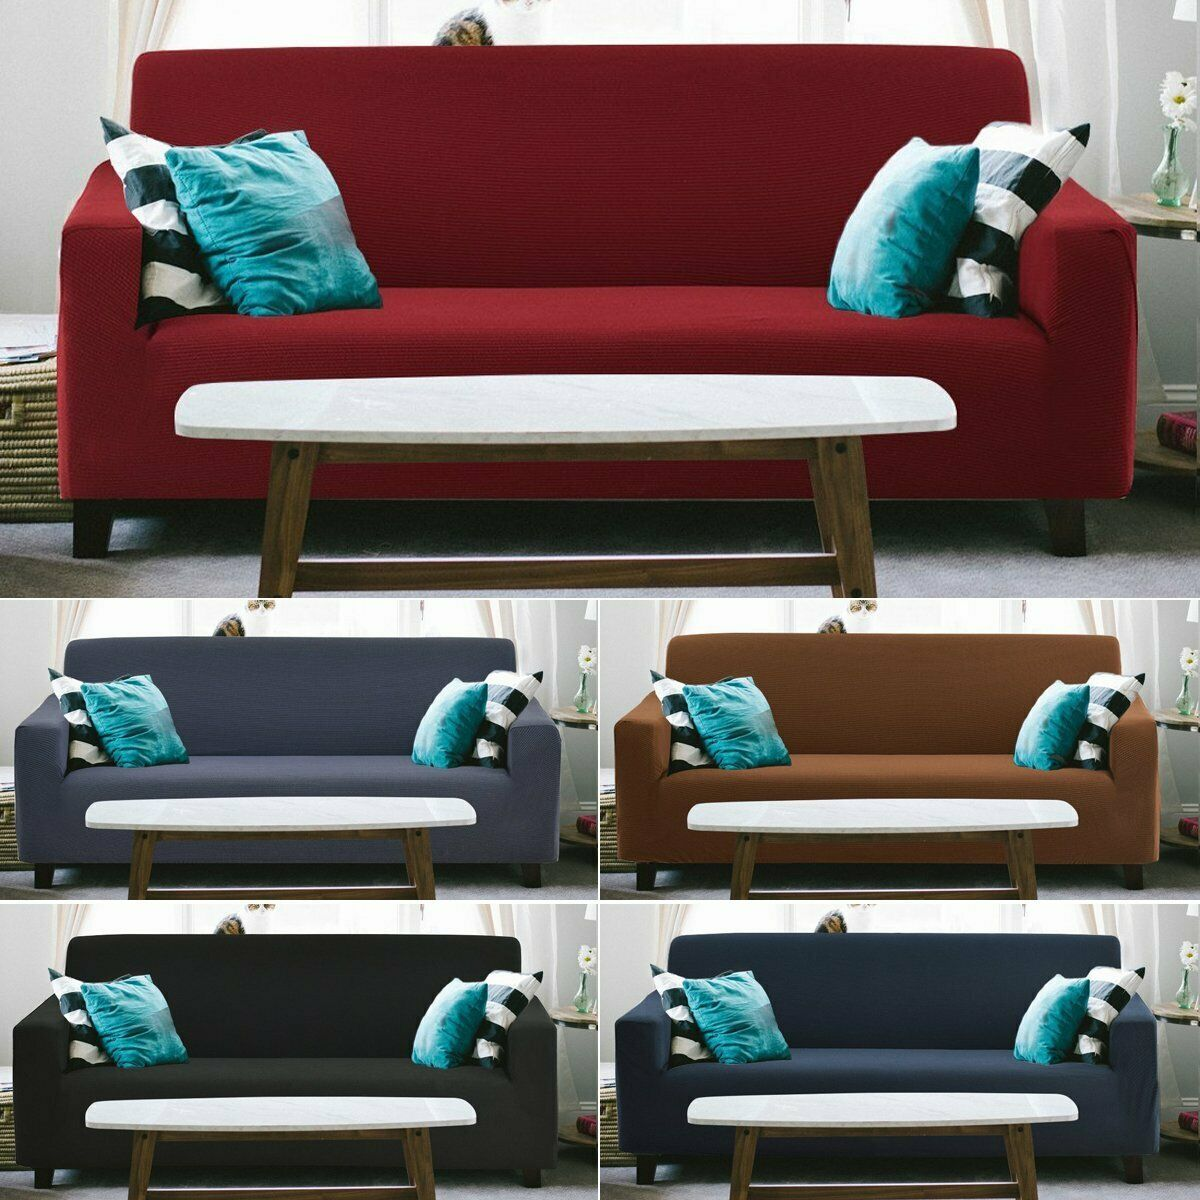 1 2 3 4 Seaters Sofa Couch Slipcover Stretch Covers Elastic Protector Easy Fit Sofa Slipcover Ideas Of Sofa Sli Sofa Settee Sofa